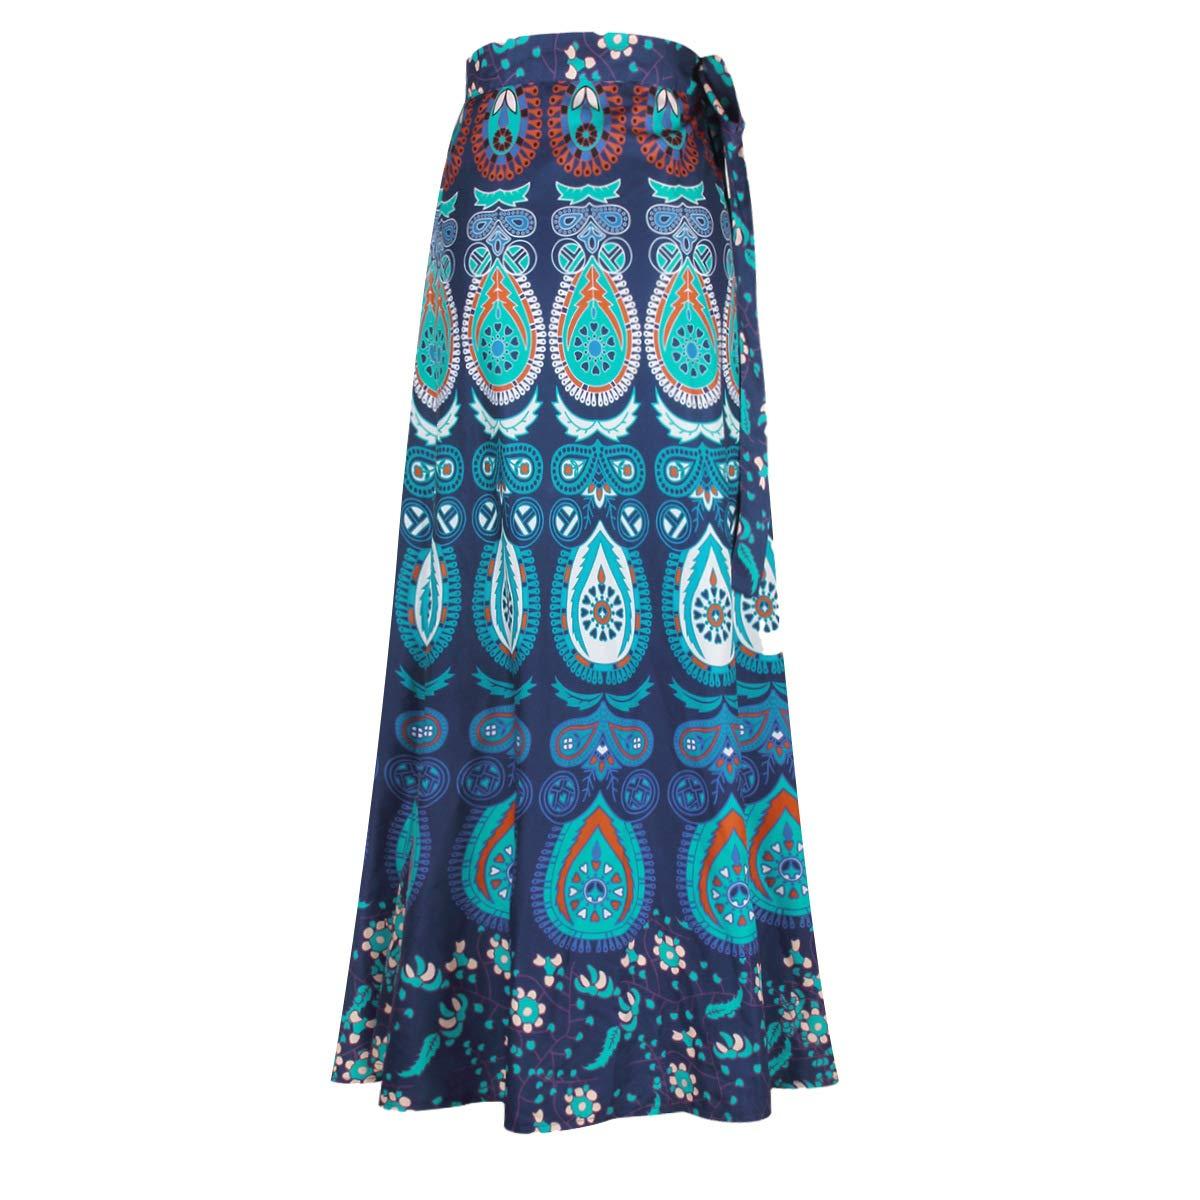 Falda Mujer Primavera Verano Fashion Impresión Falda Maxi Etnica ...